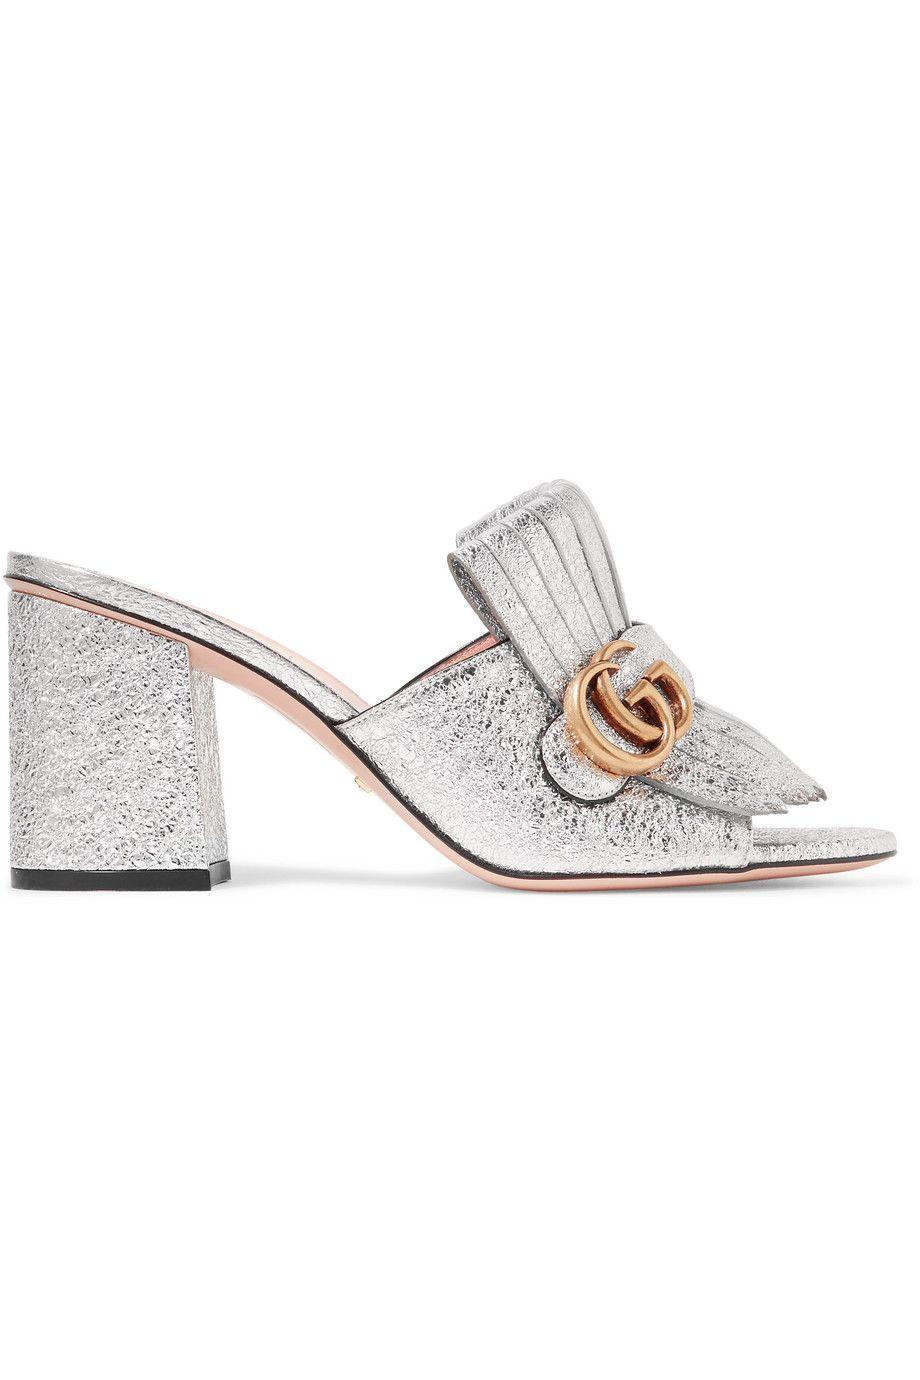 #PopbelaOOTD: Fashion Item yang Siap Buat Gaya Kamu Lebih All Out!